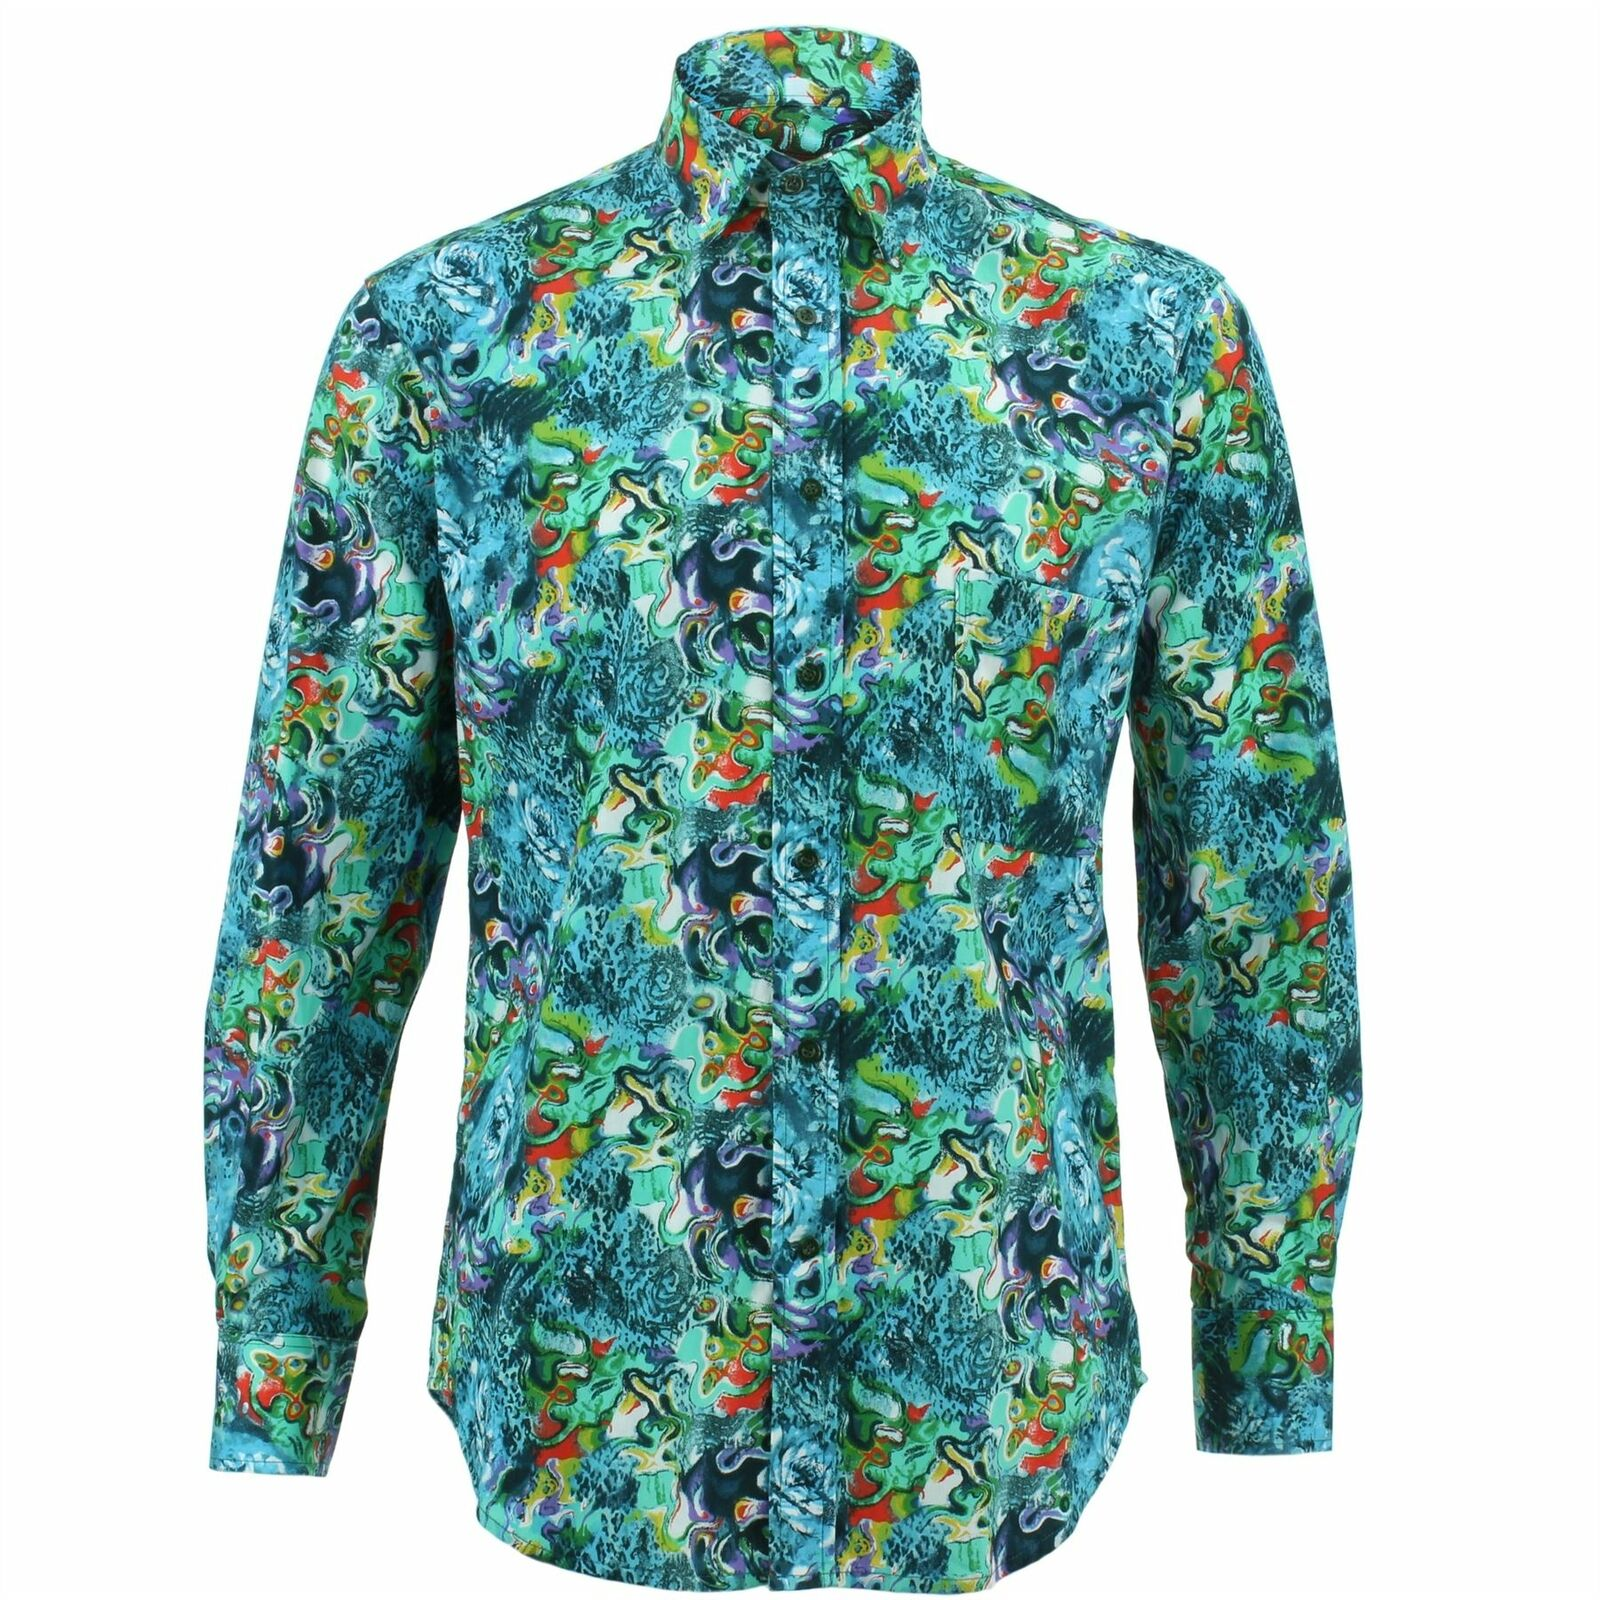 Mens Shirt Loud Originals REGULAR FIT Paint Green Retro Psychedelic Fancy